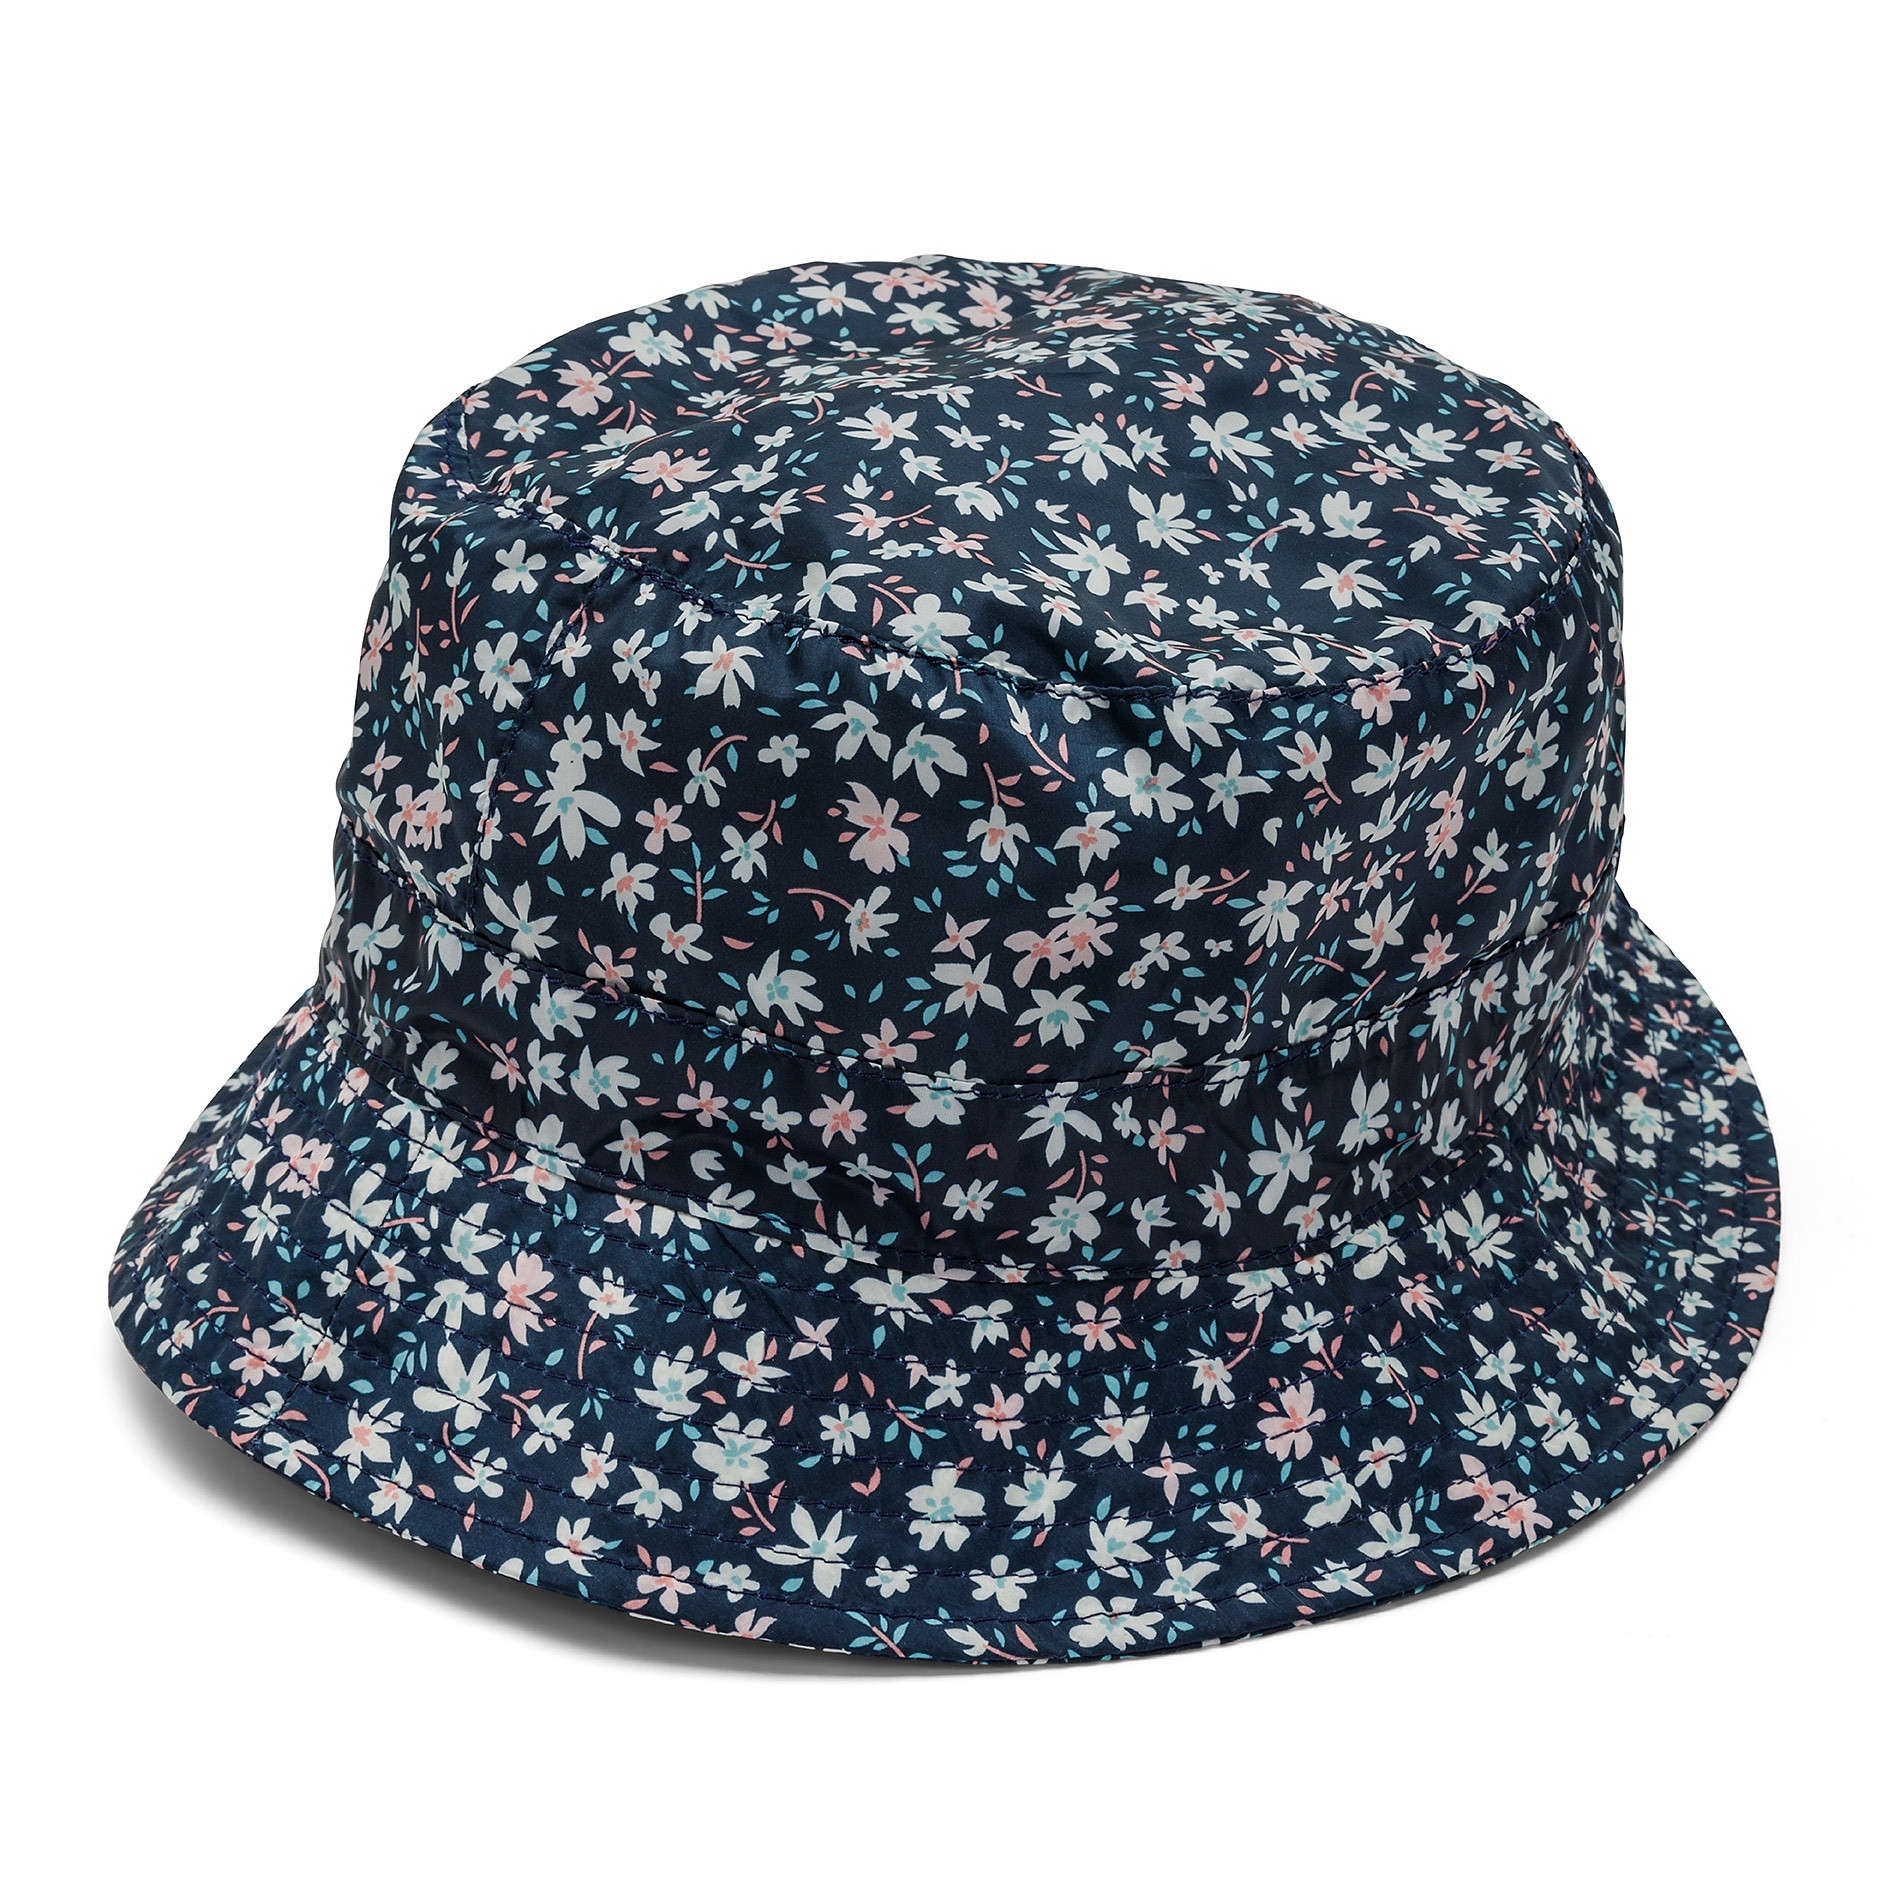 Cappello antipioggia con stampa Koan, Blu scuro, large image number 0